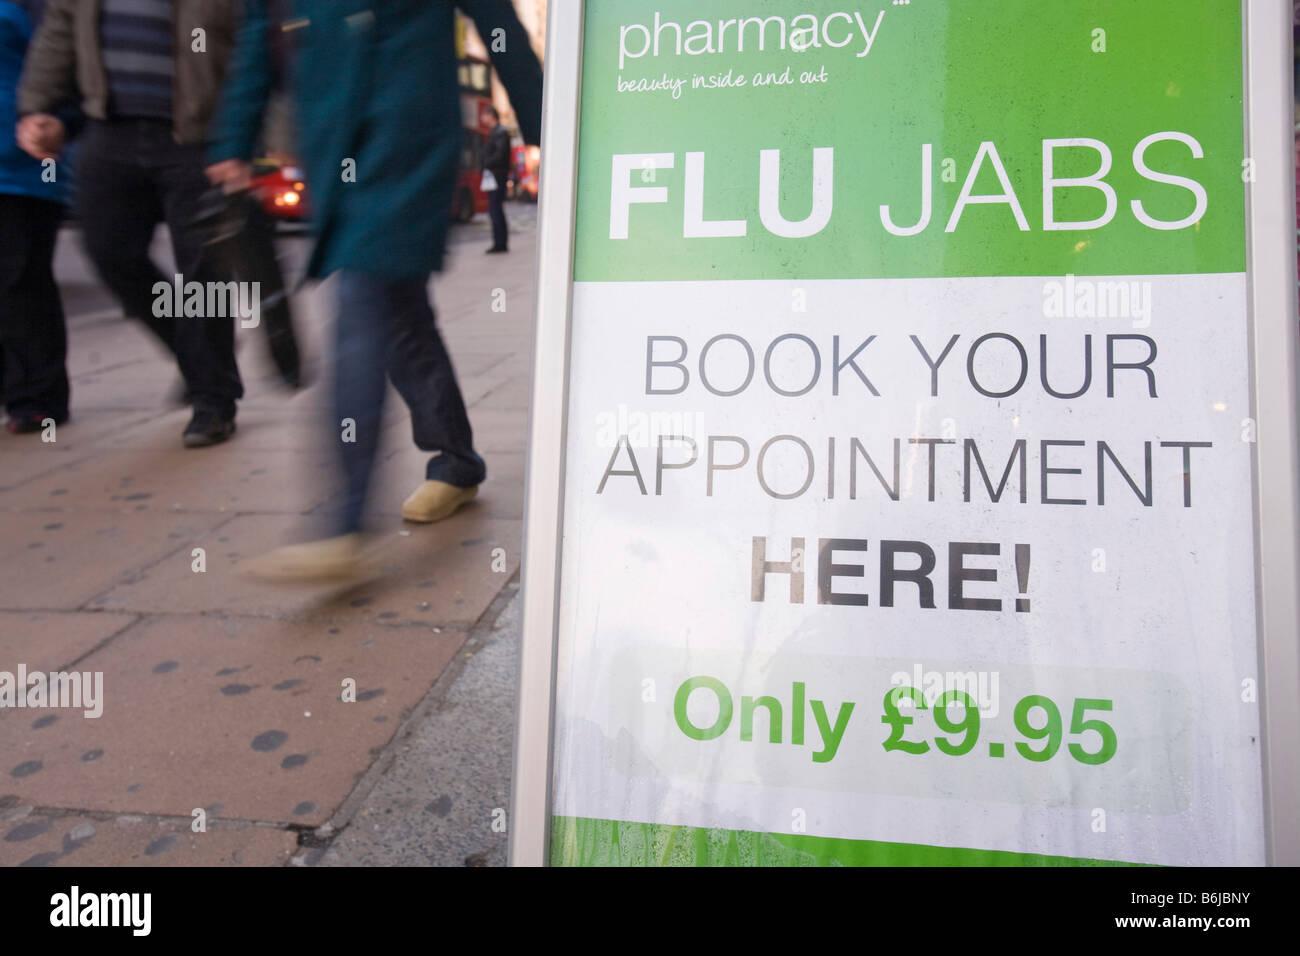 Advertising Flu jabs outside a chemist in London - Stock Image